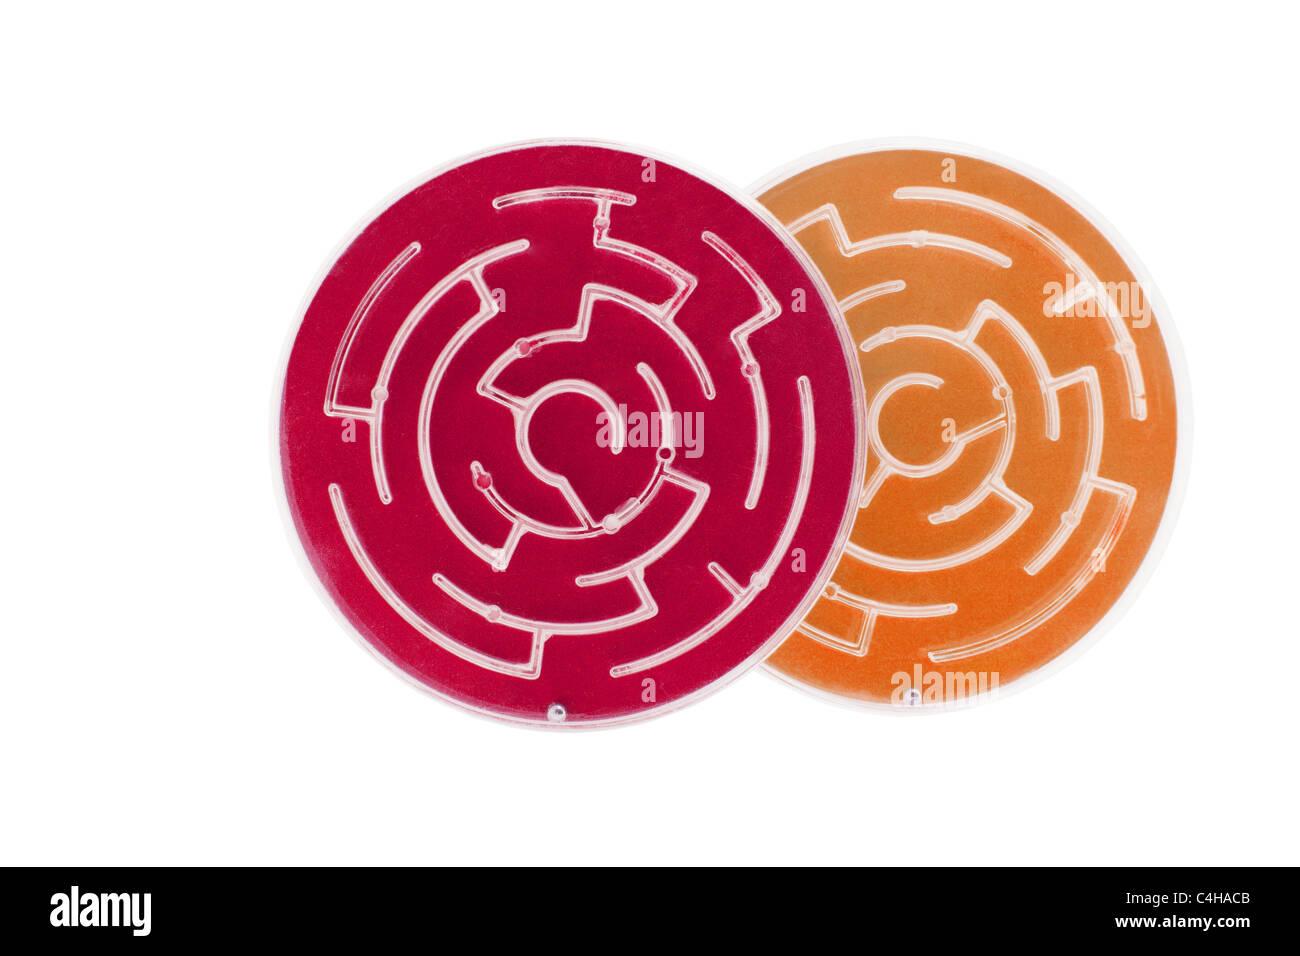 Plastic Maze Game - Stock Image